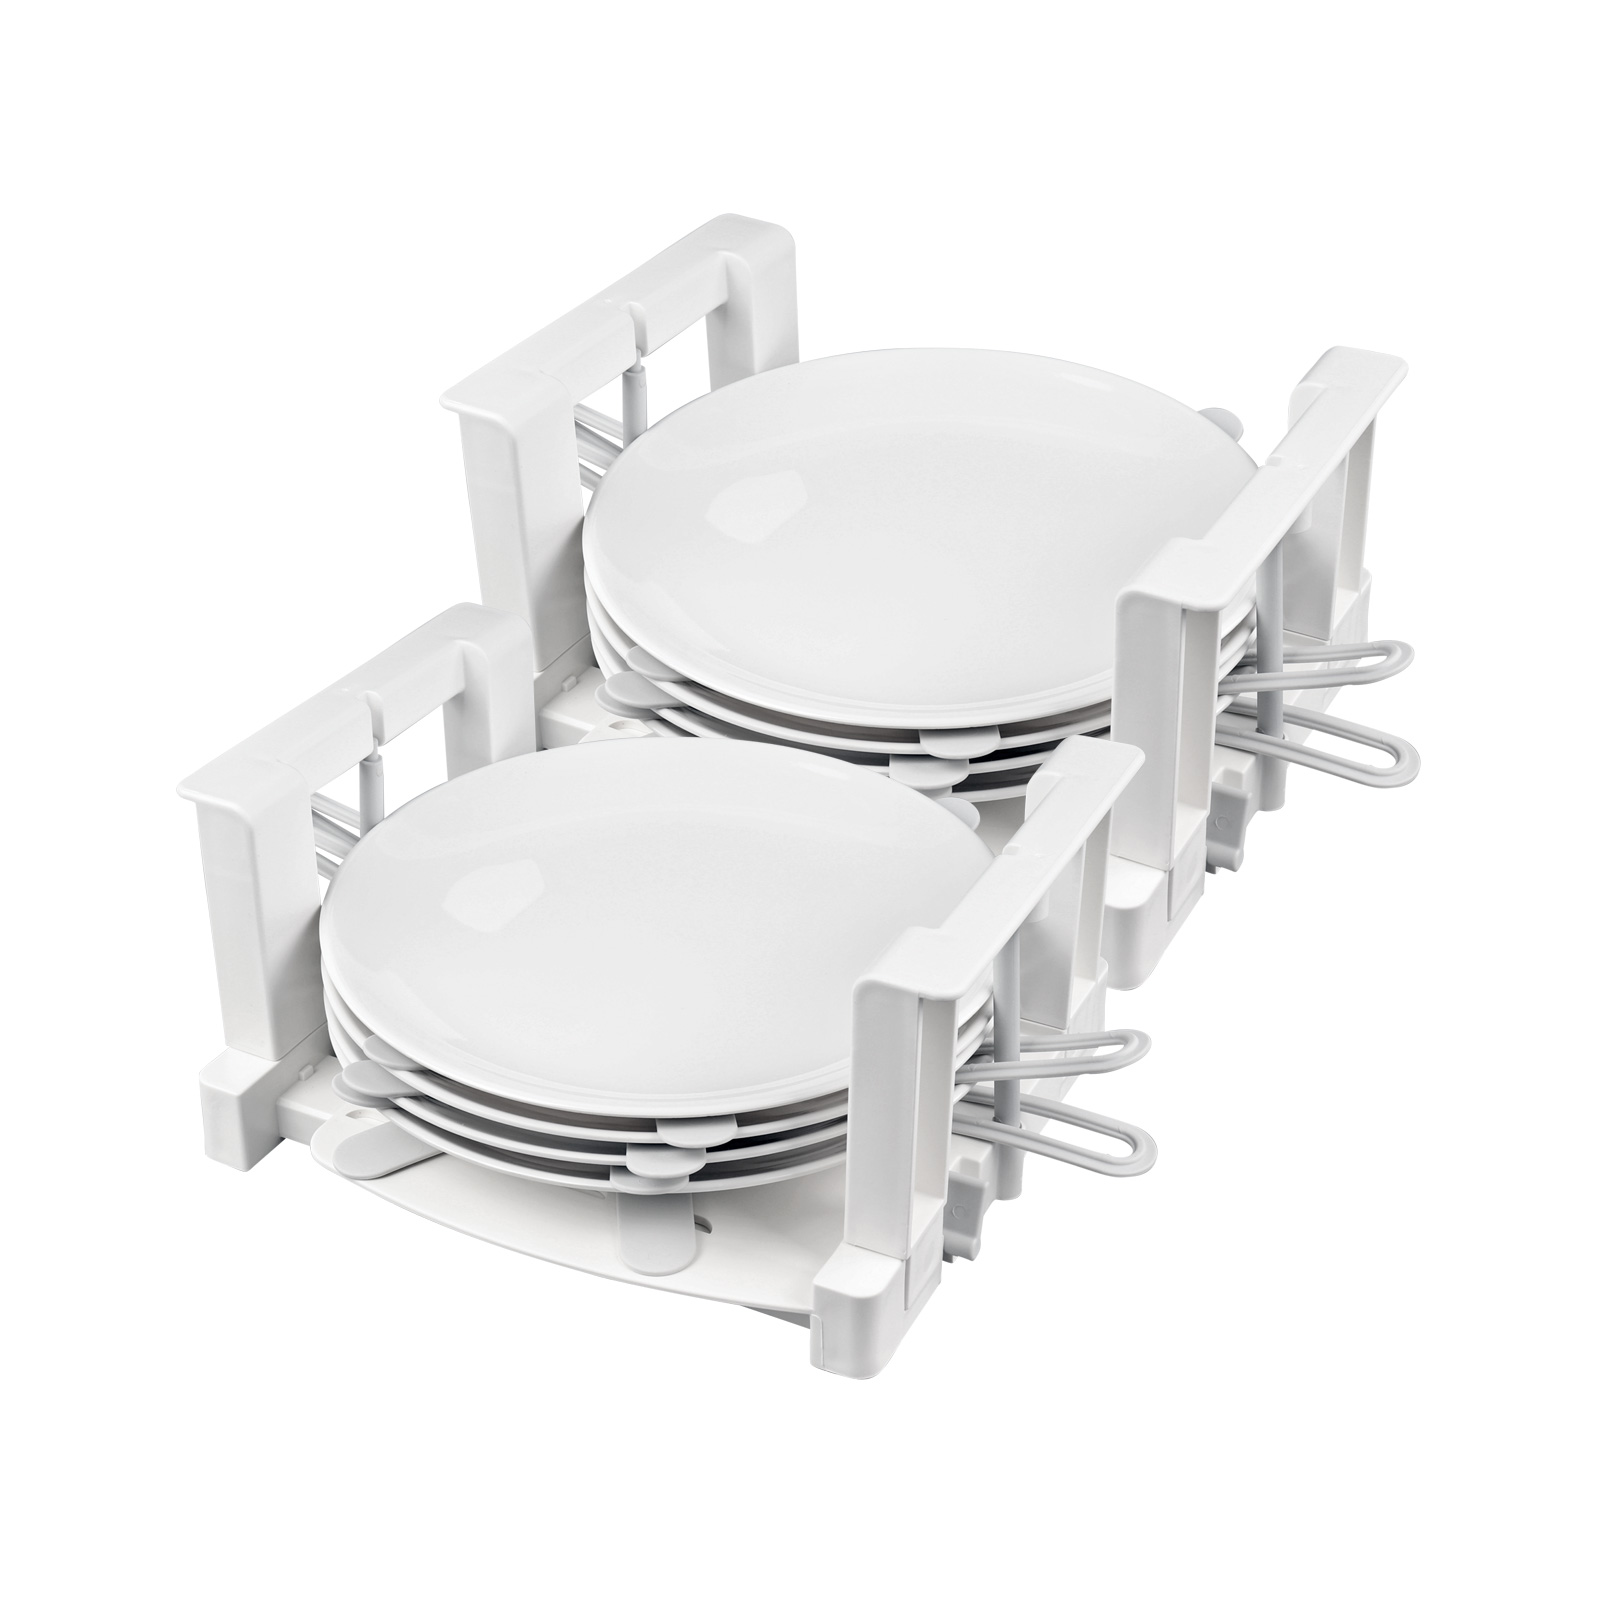 Froli Tellerhalter Wohnmobil 2er Set, 6 Teller Geschirrhalter